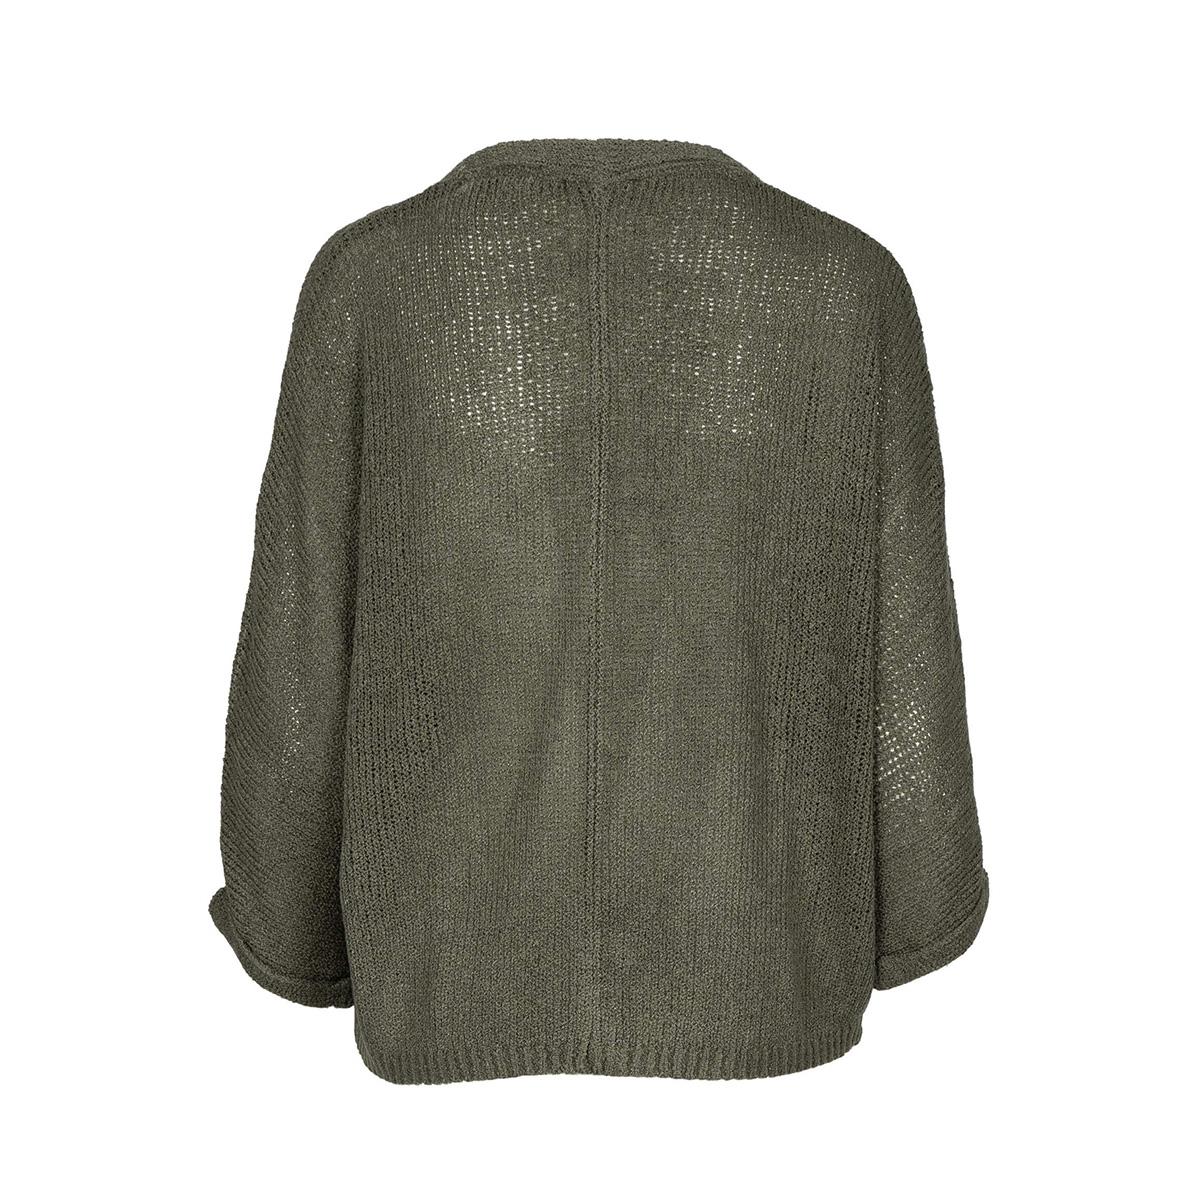 nonchalant vestje 0306 012 4500 zusss vest groen